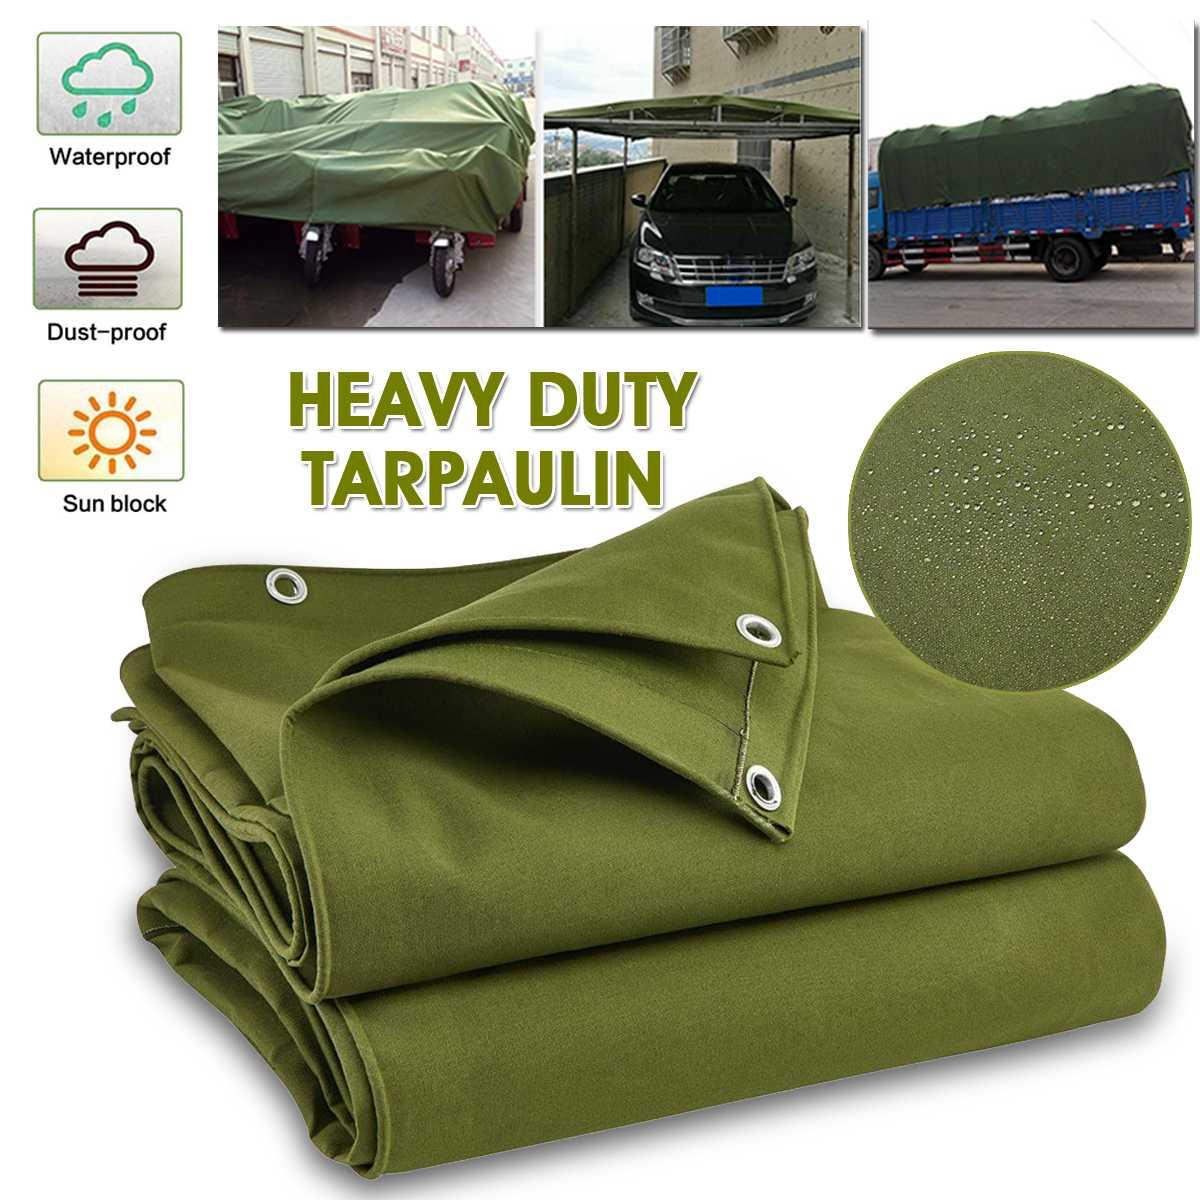 0.5mm Thick Tarpaulin Rainproof Cloth Waterproof Cover Sunshade Awning Wear-resisting Truck Car Canvas Balcony Courtyard Shade